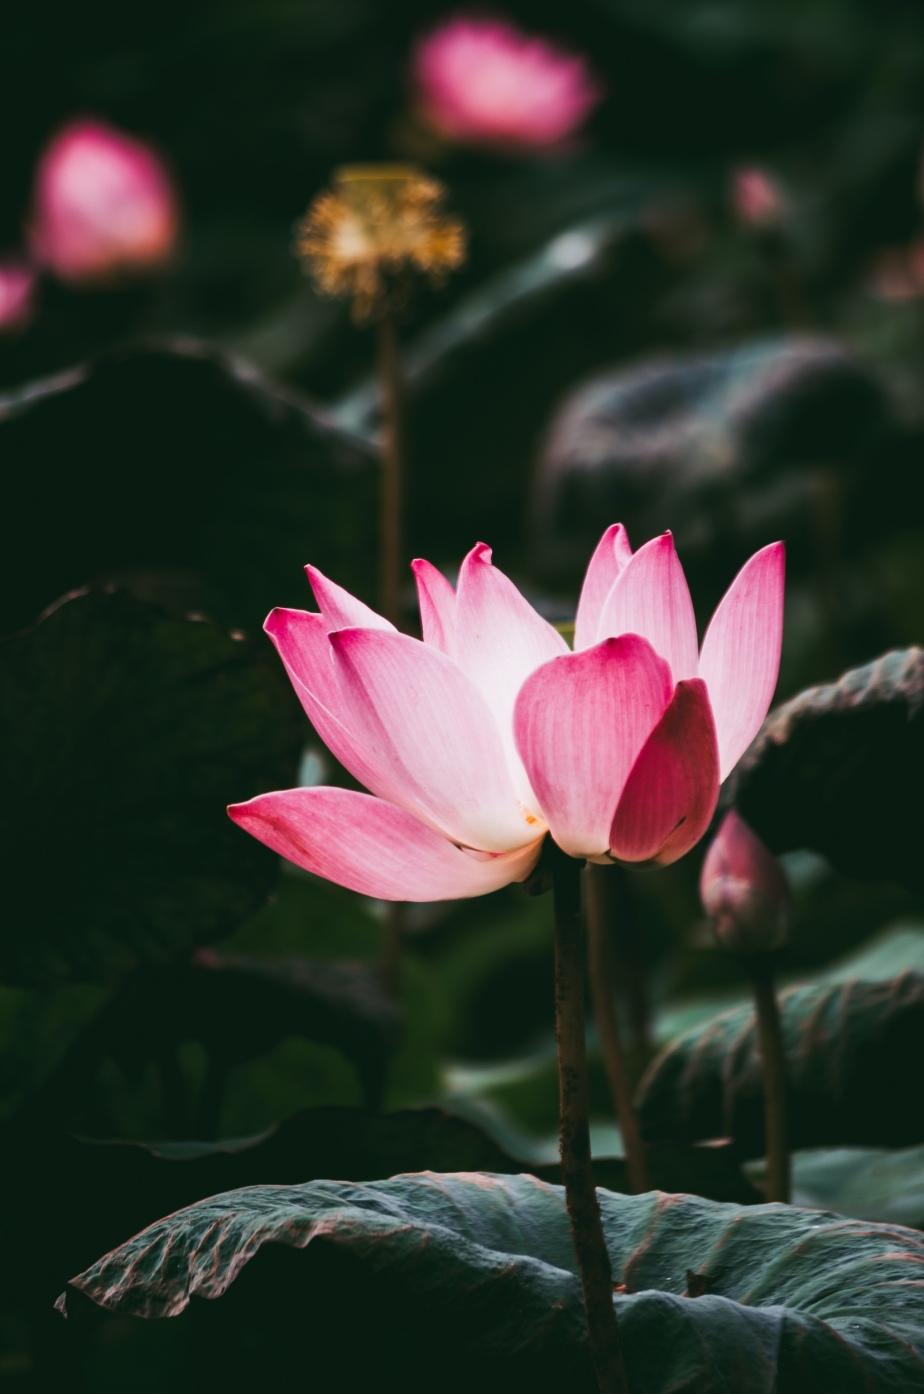 Video Poem: Sensual Yoga Music, by MarkTulin